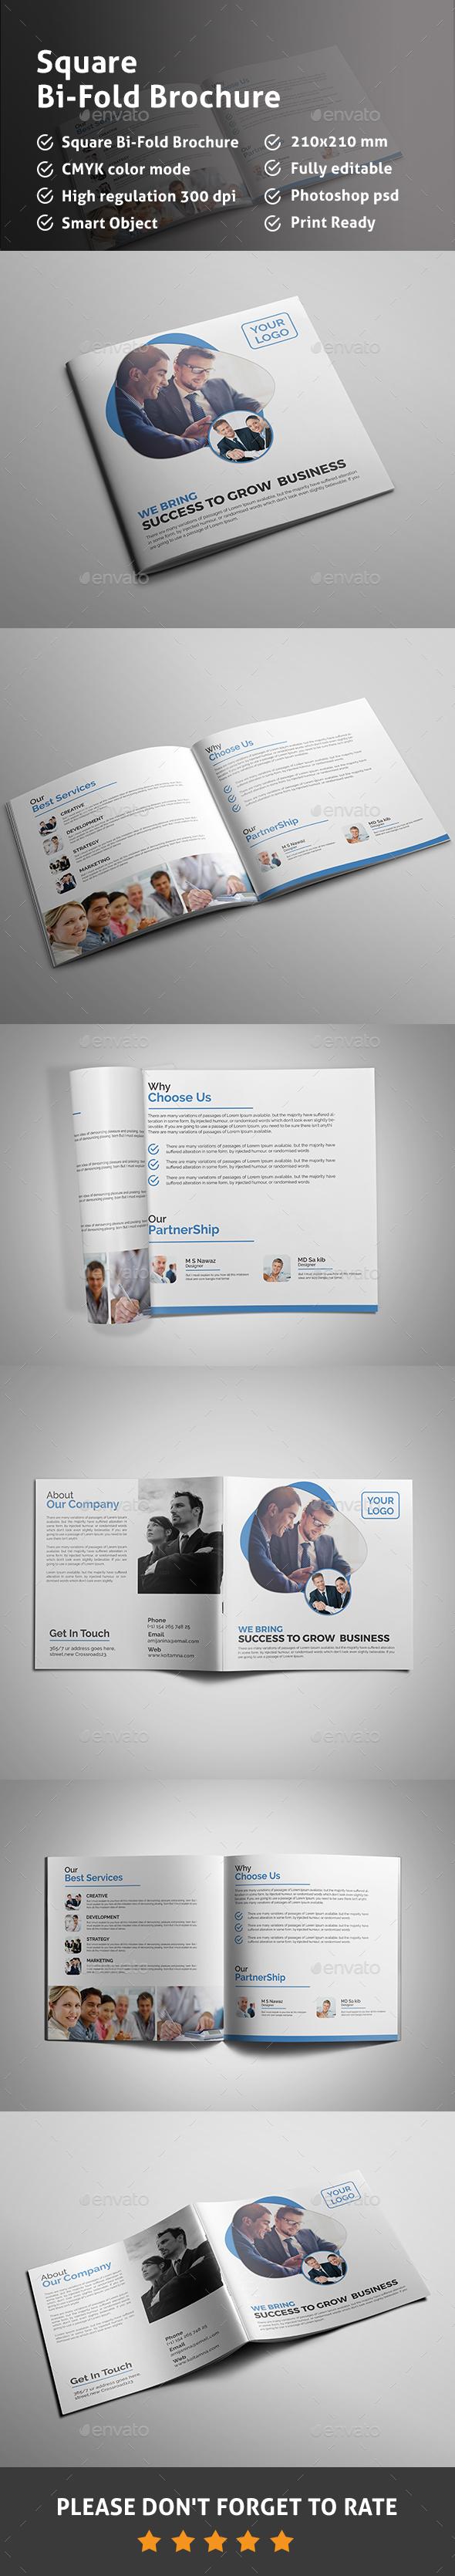 Square Bi Fold Brochure - Signage Print Templates